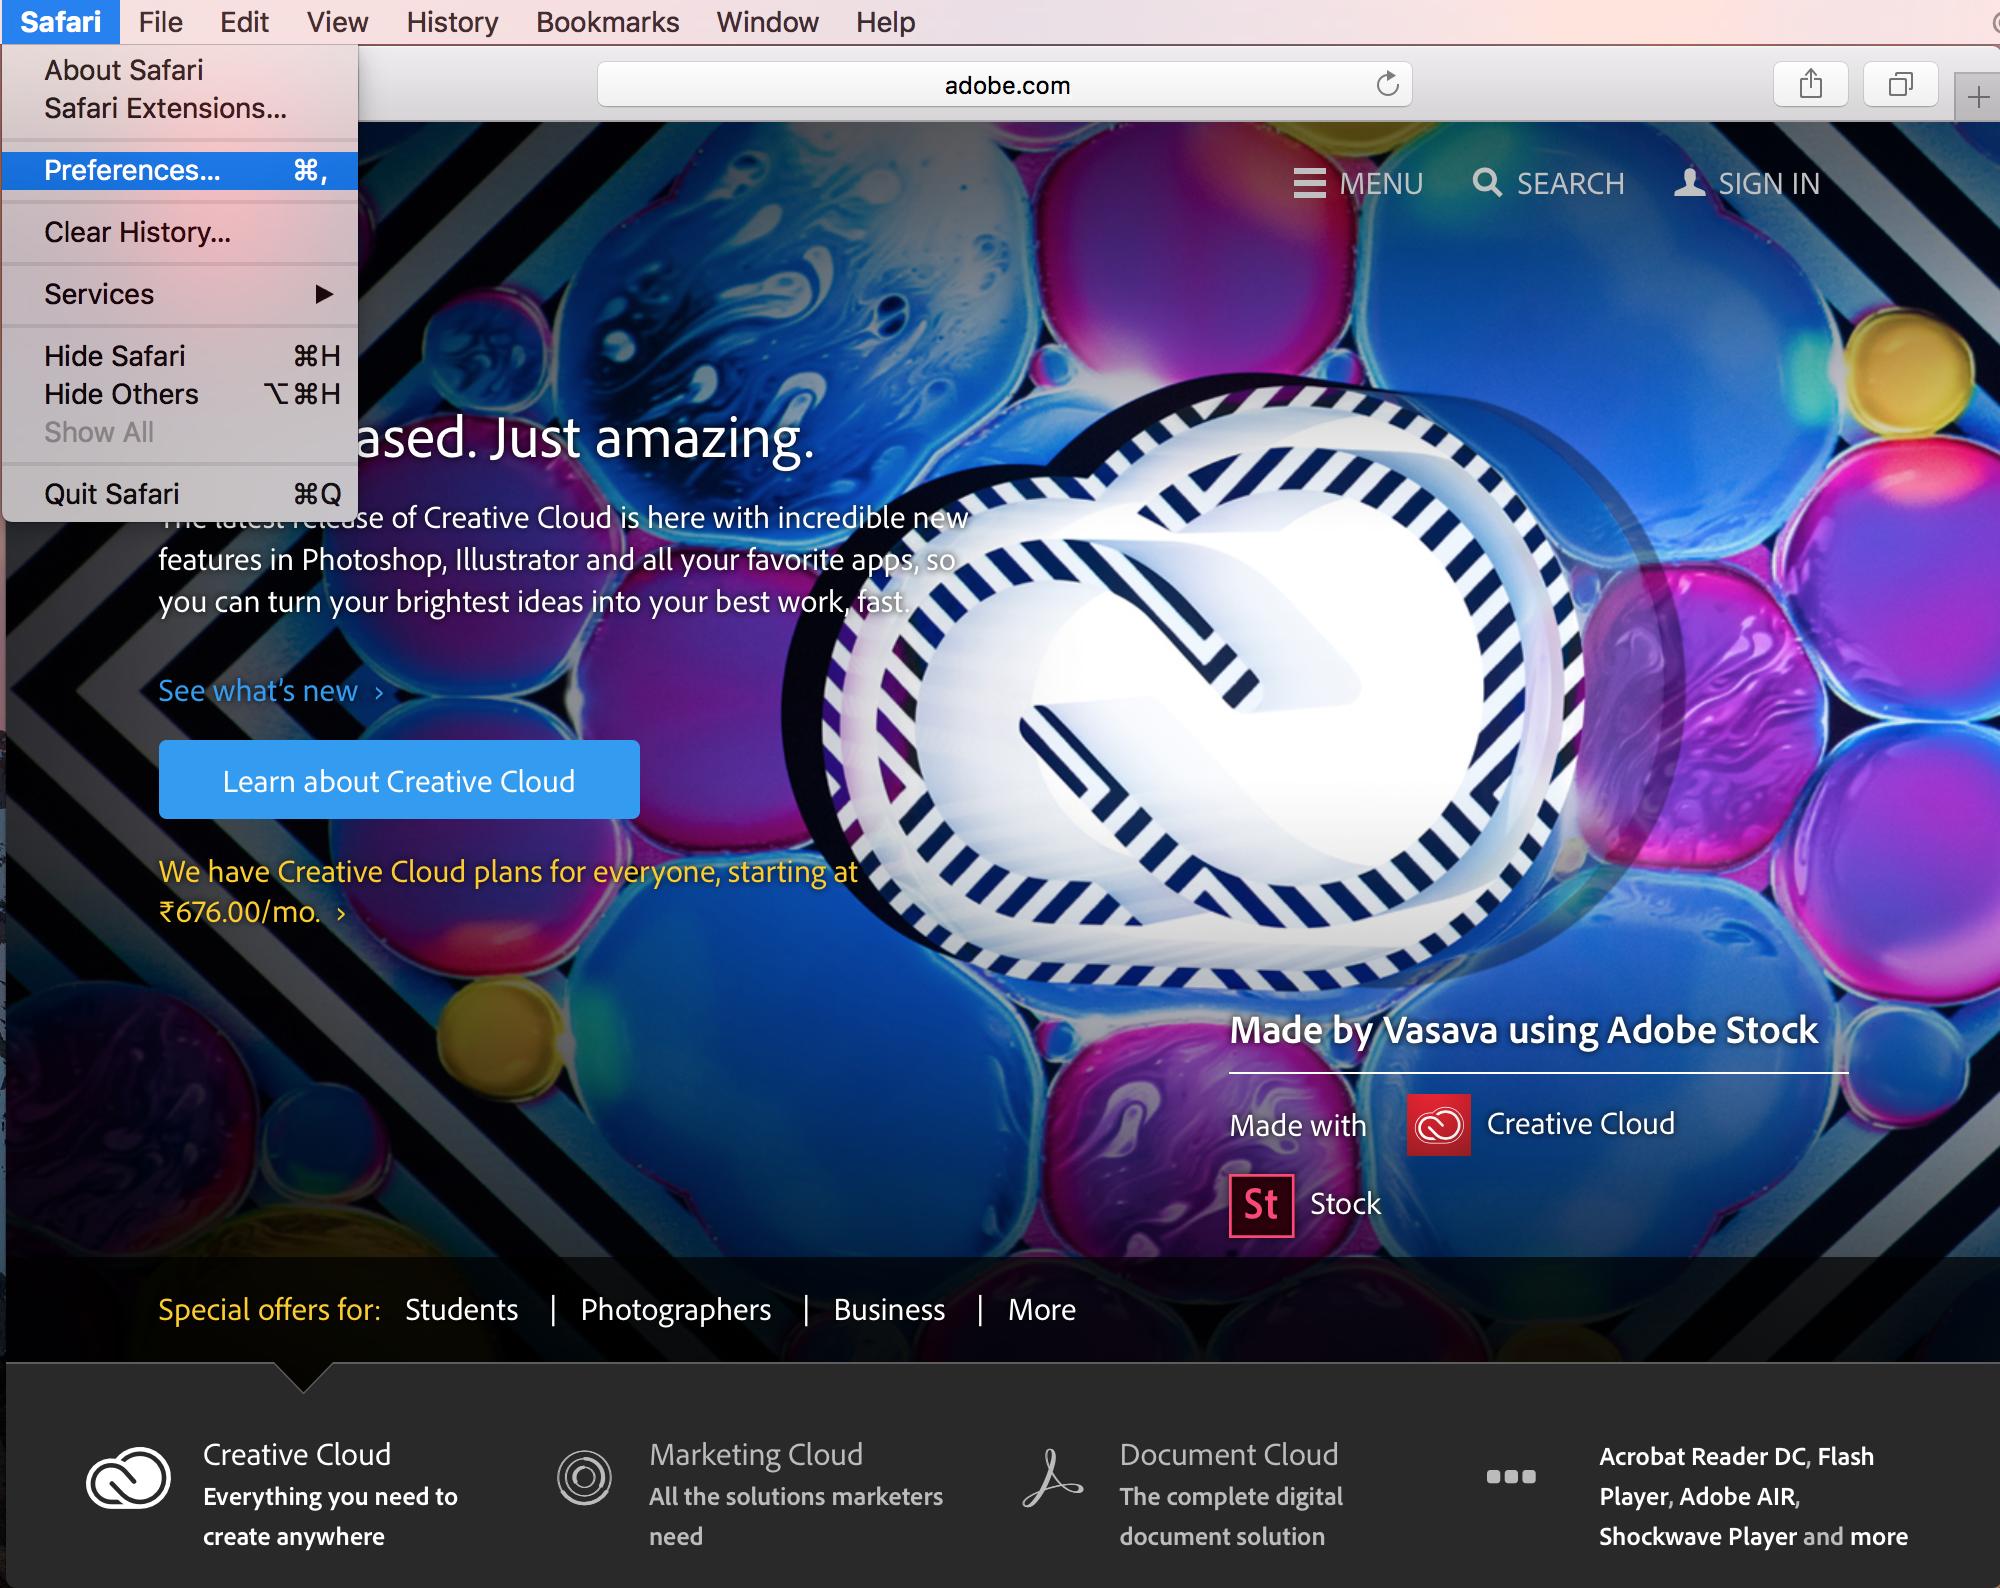 تحميل برنامج Adobe AIR